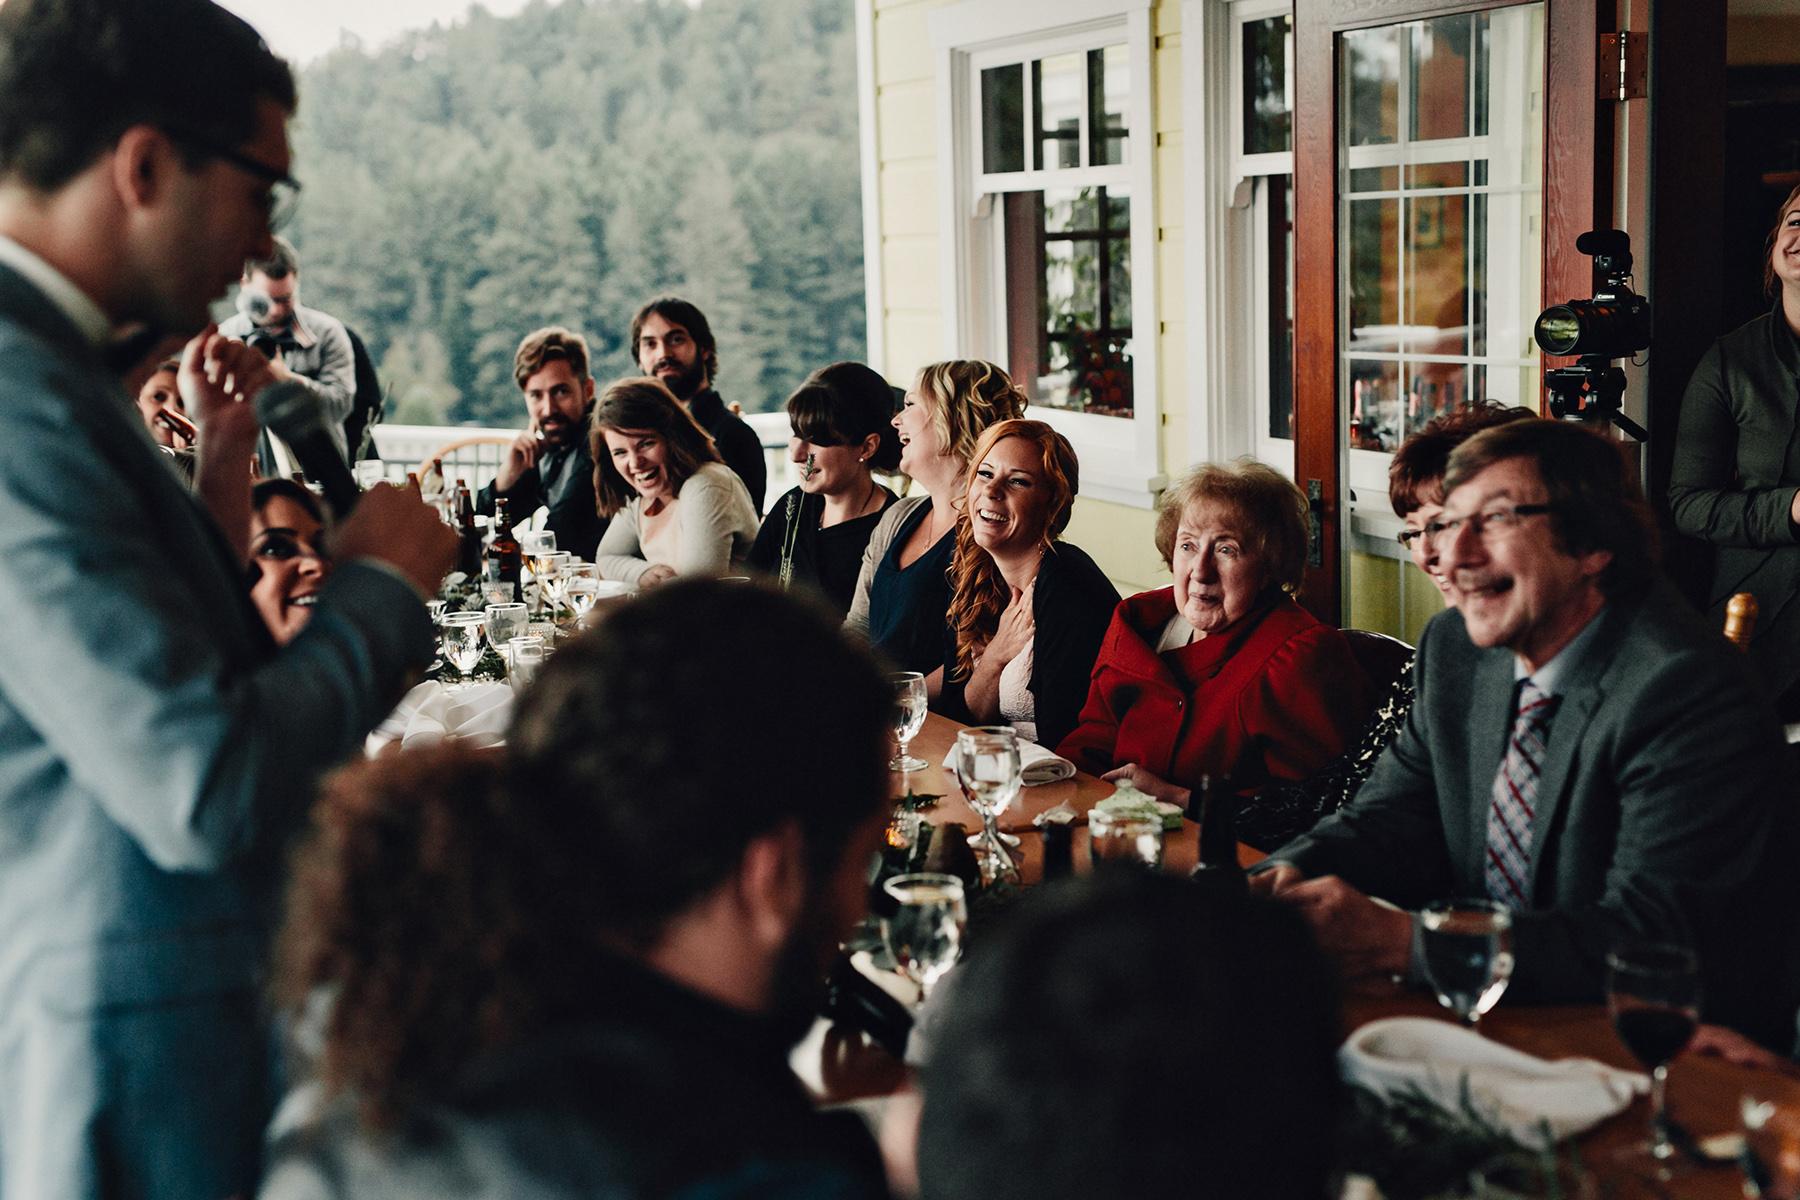 chelsea-brian-wedding-photos-0013.jpg